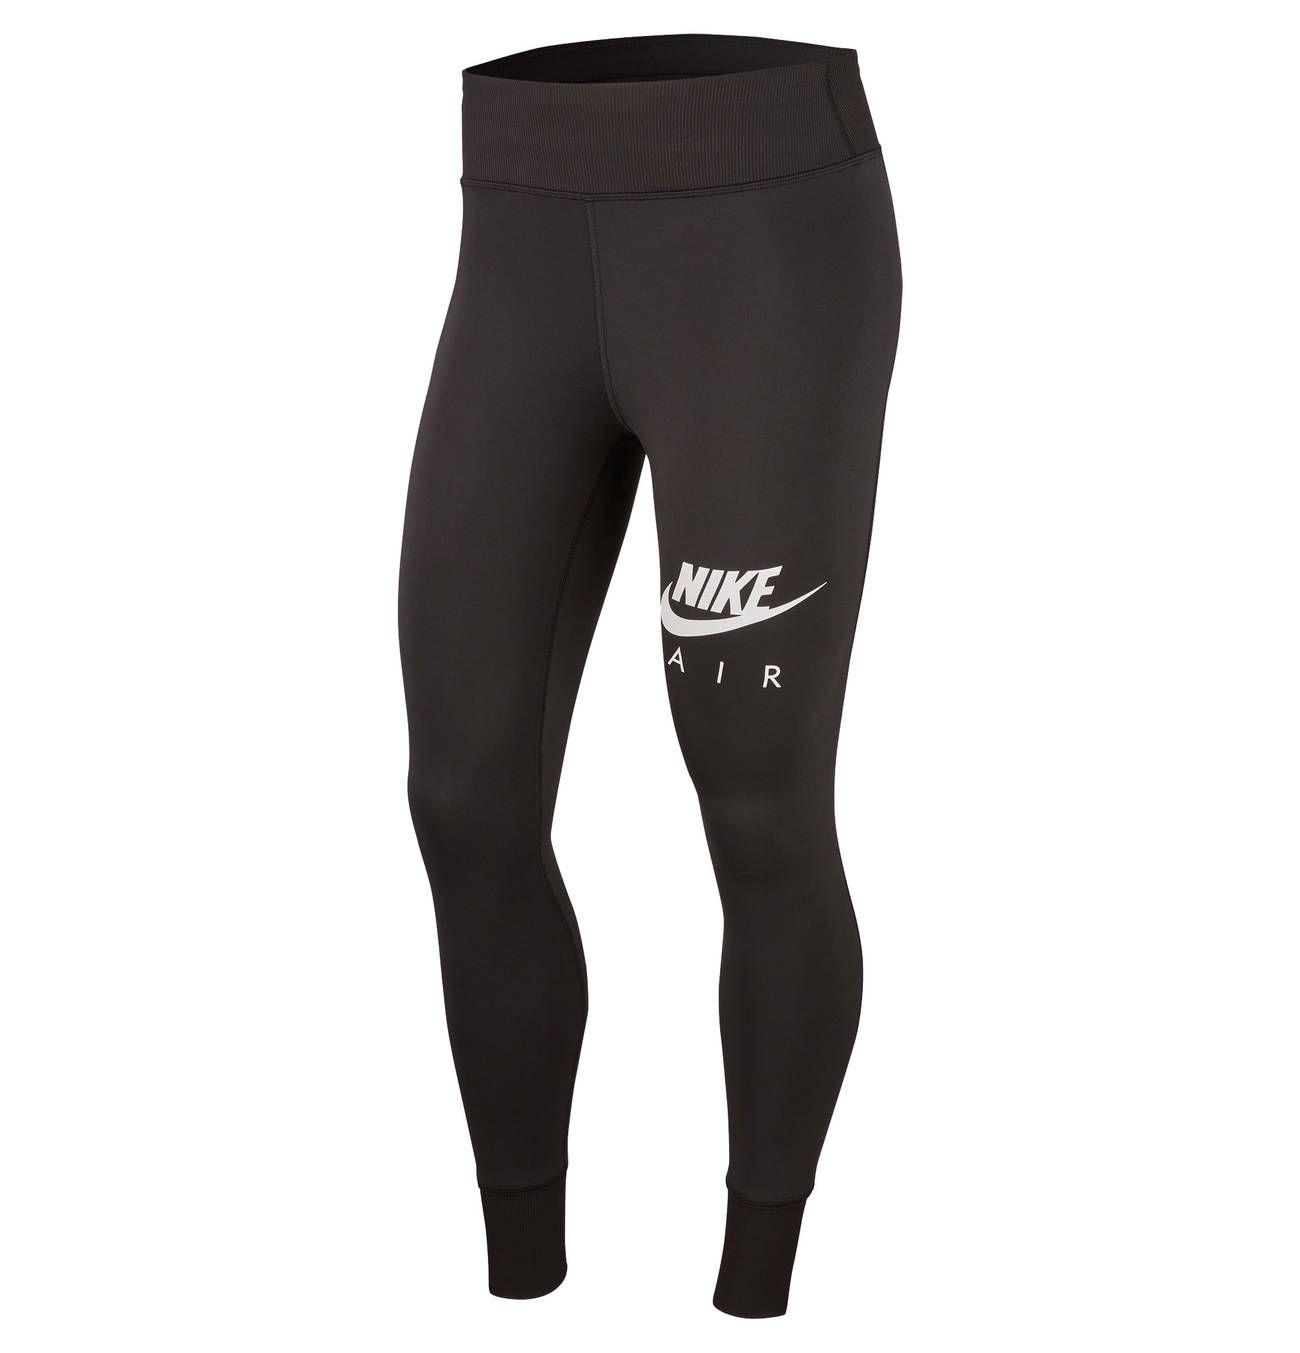 Nike Damen Sport Fitness Legging NP CL Tight Pro Dri Fit Hose Spotted Cat 889565